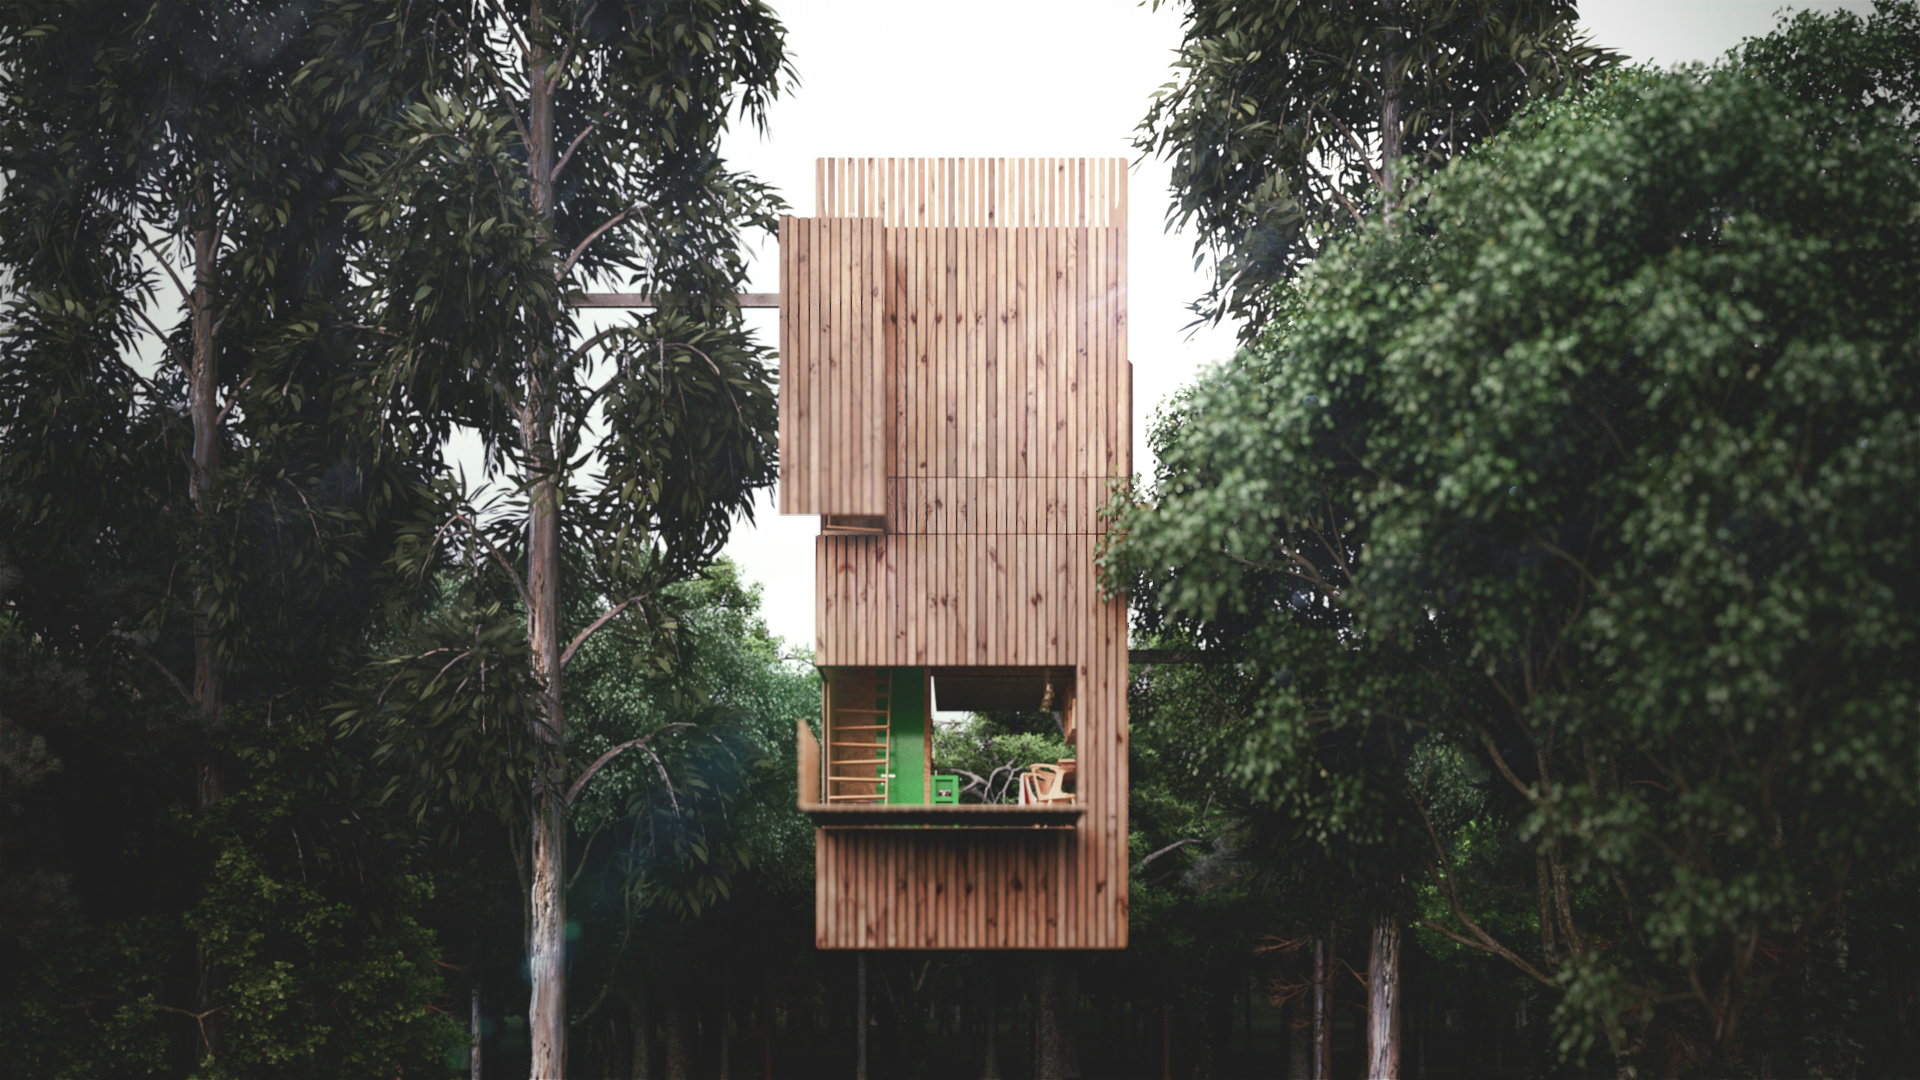 70m High Treehouse